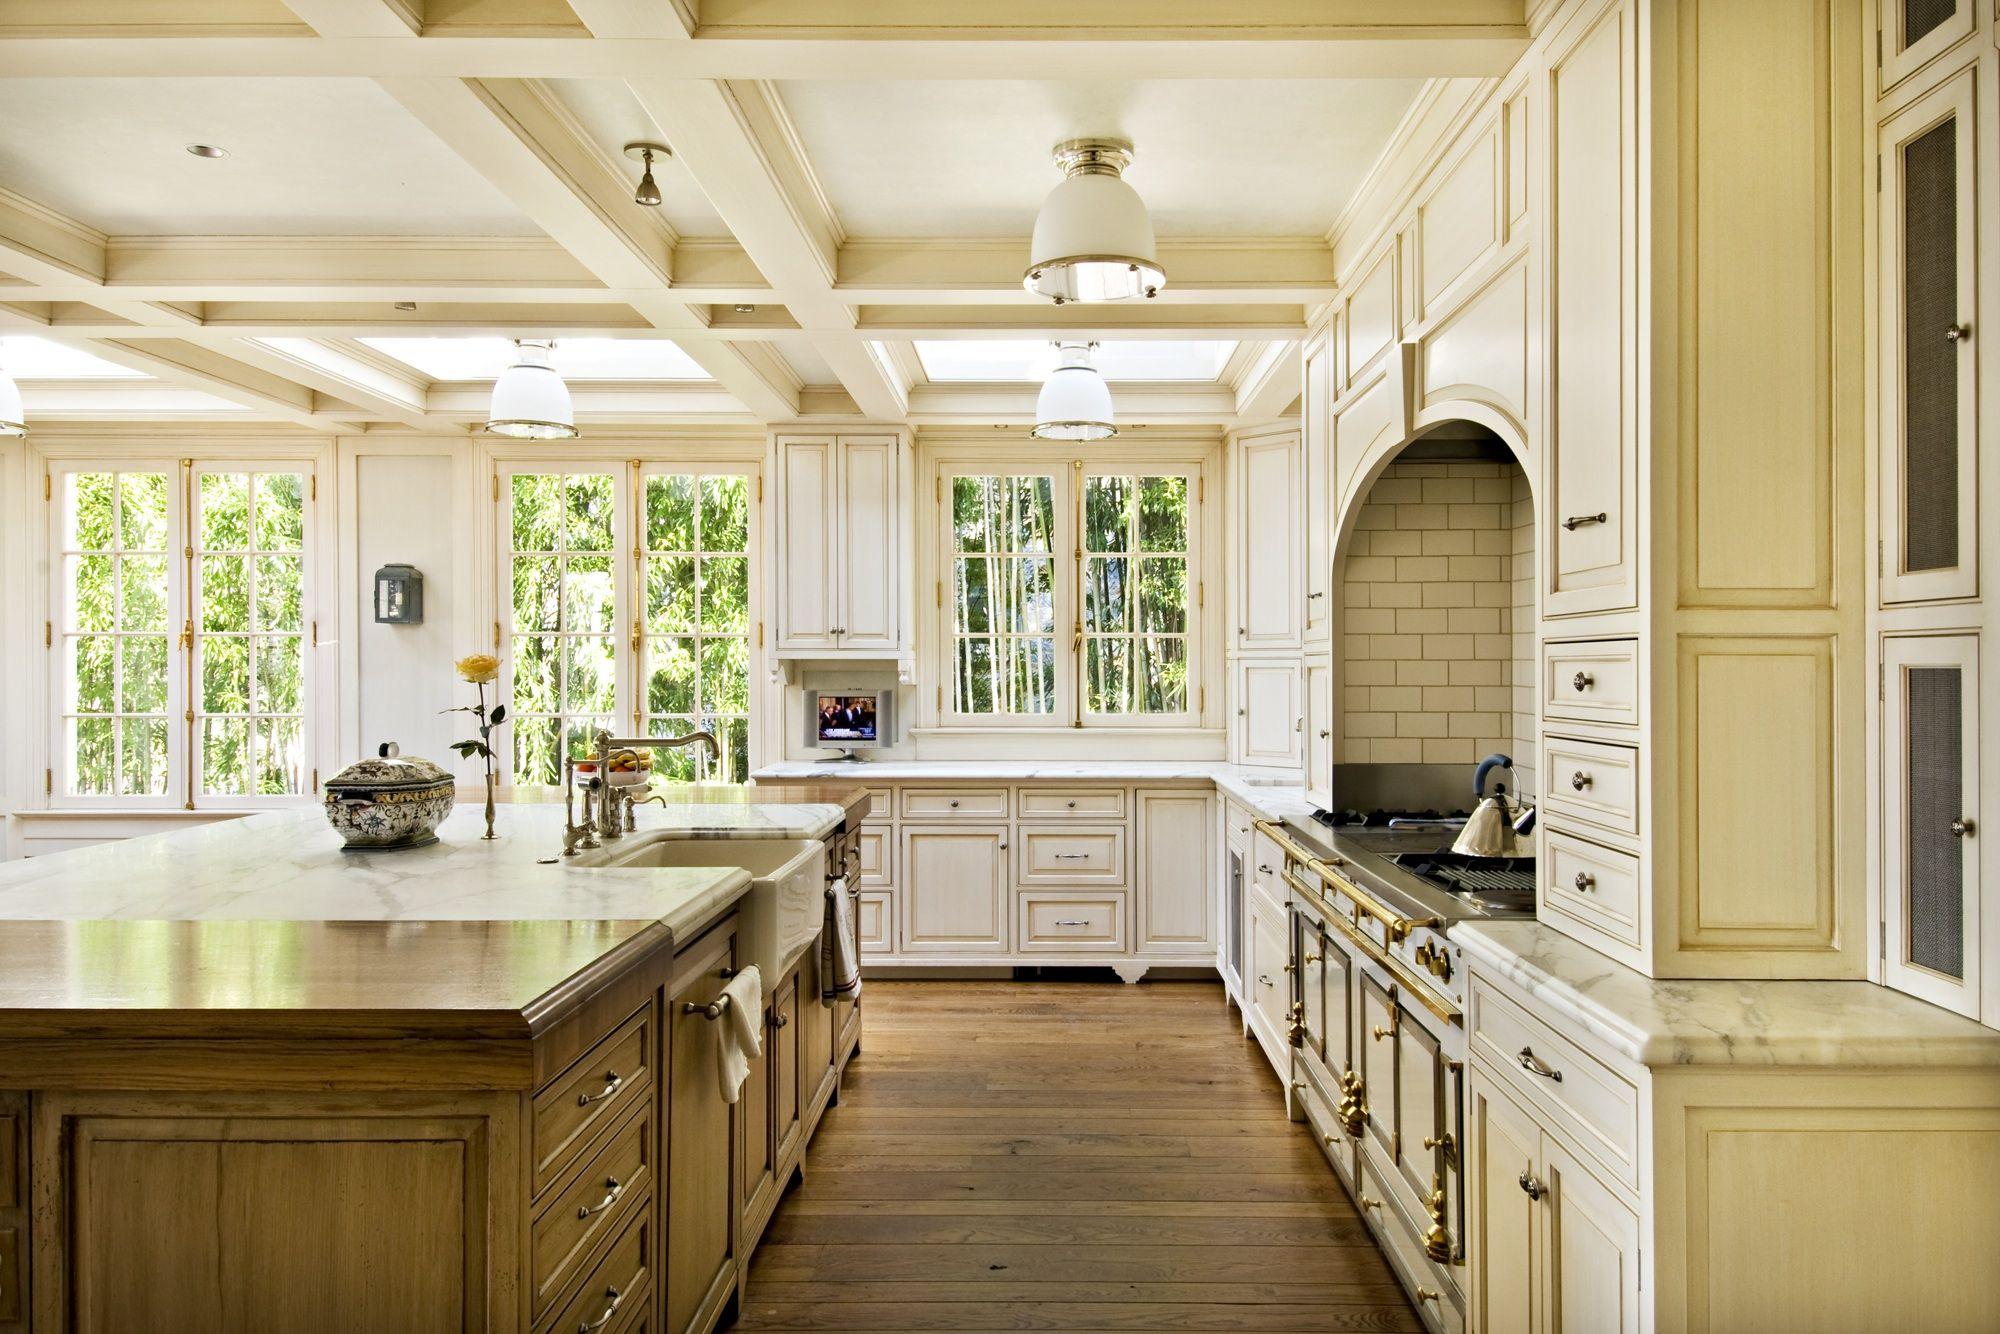 Kitchen, La Cornu Range, French Windows, Outerbridge Horsey Associates, Photo by Pipkin